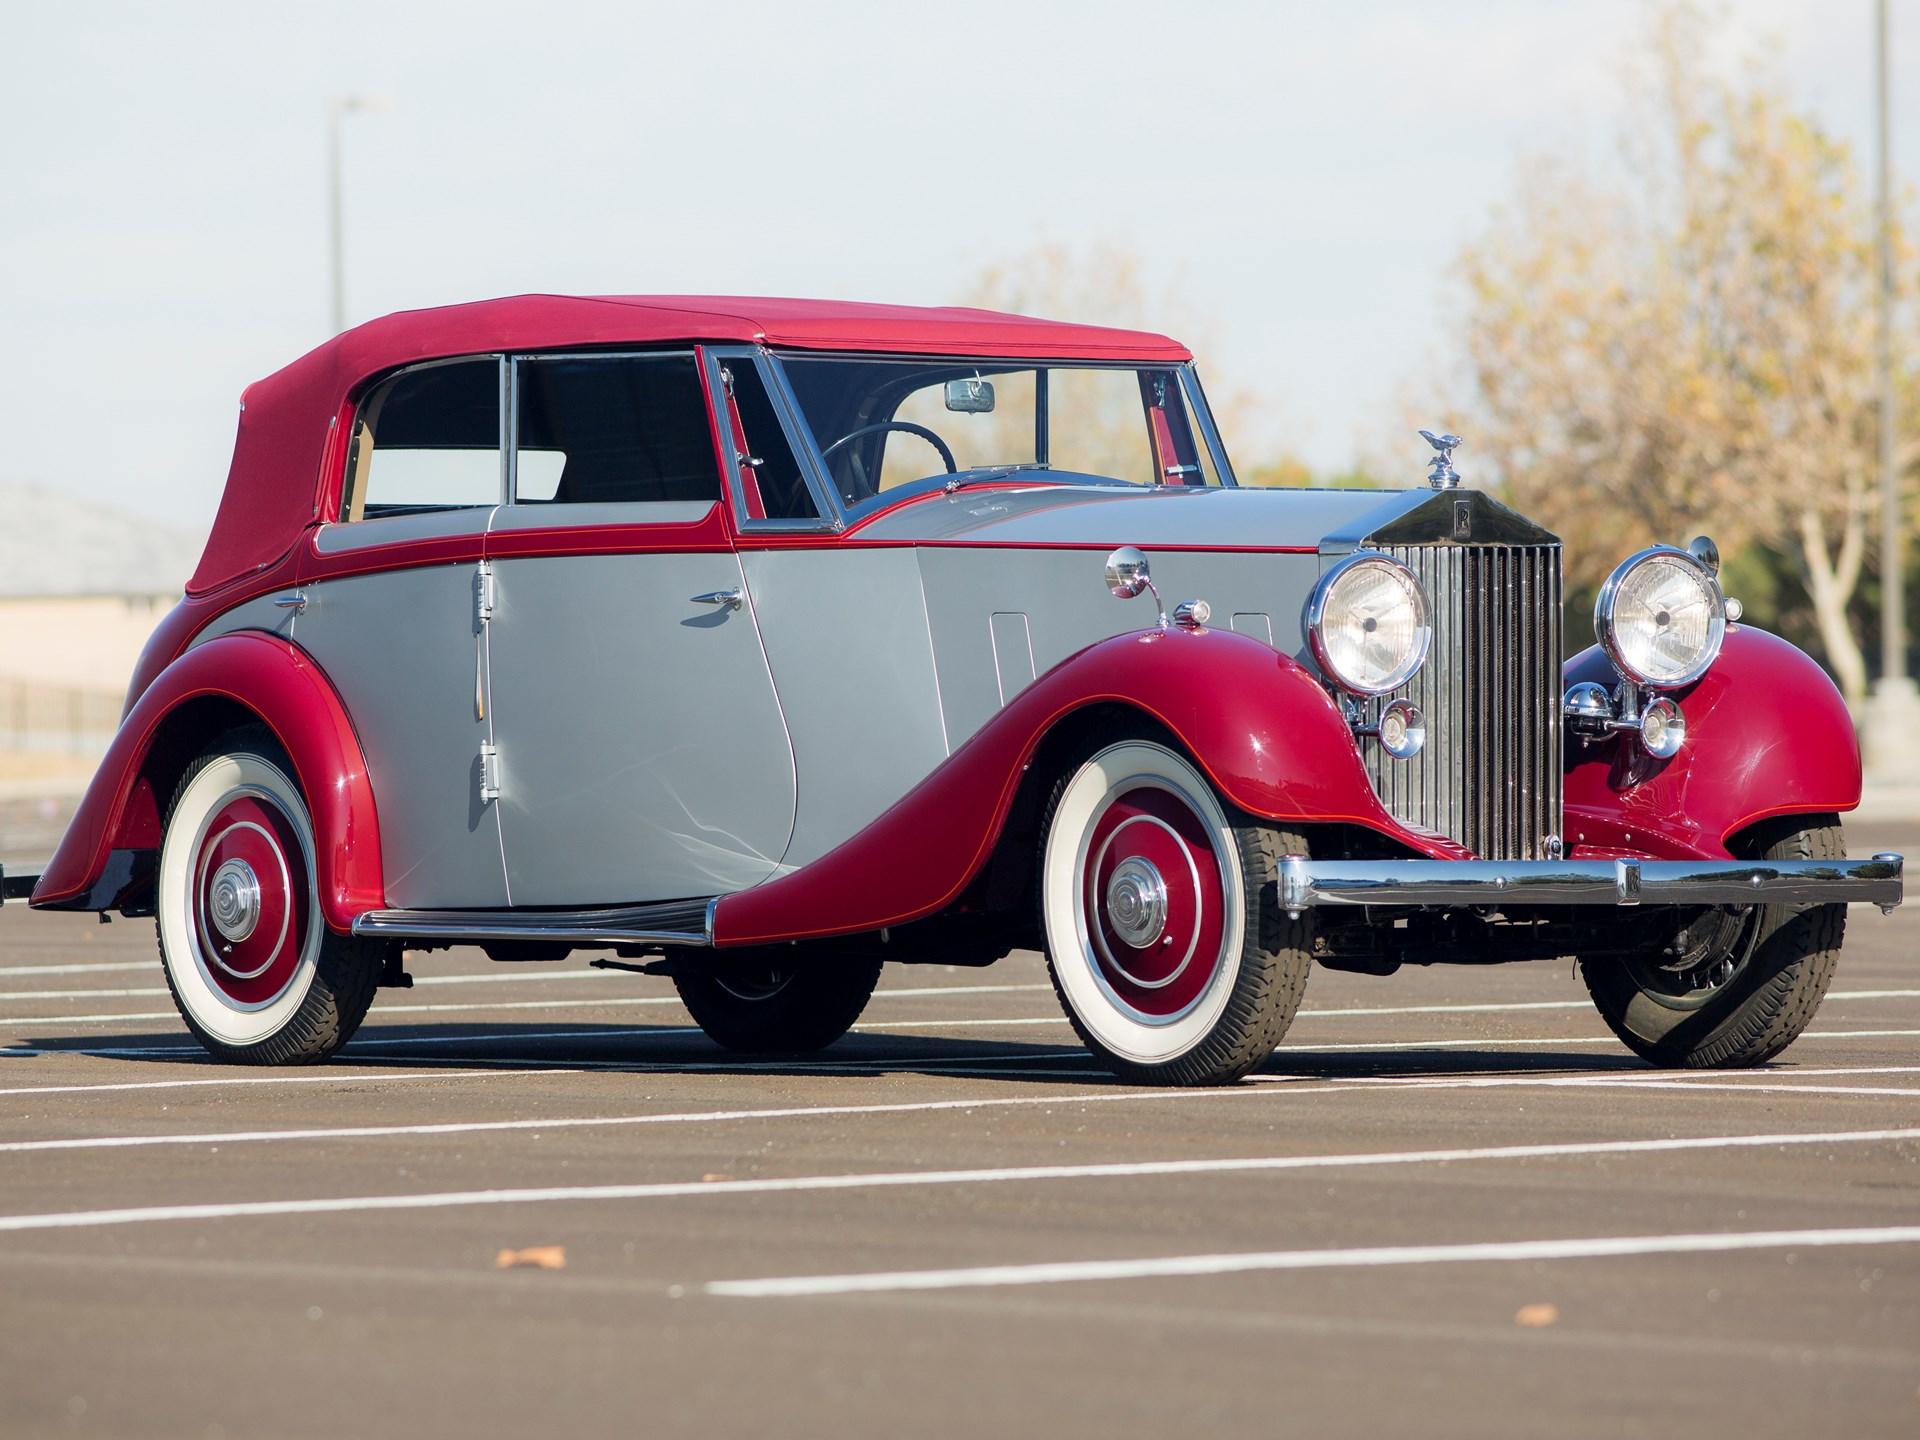 hight resolution of 1937 rolls royce 25 30 wingham four door cabriolet by martin walter